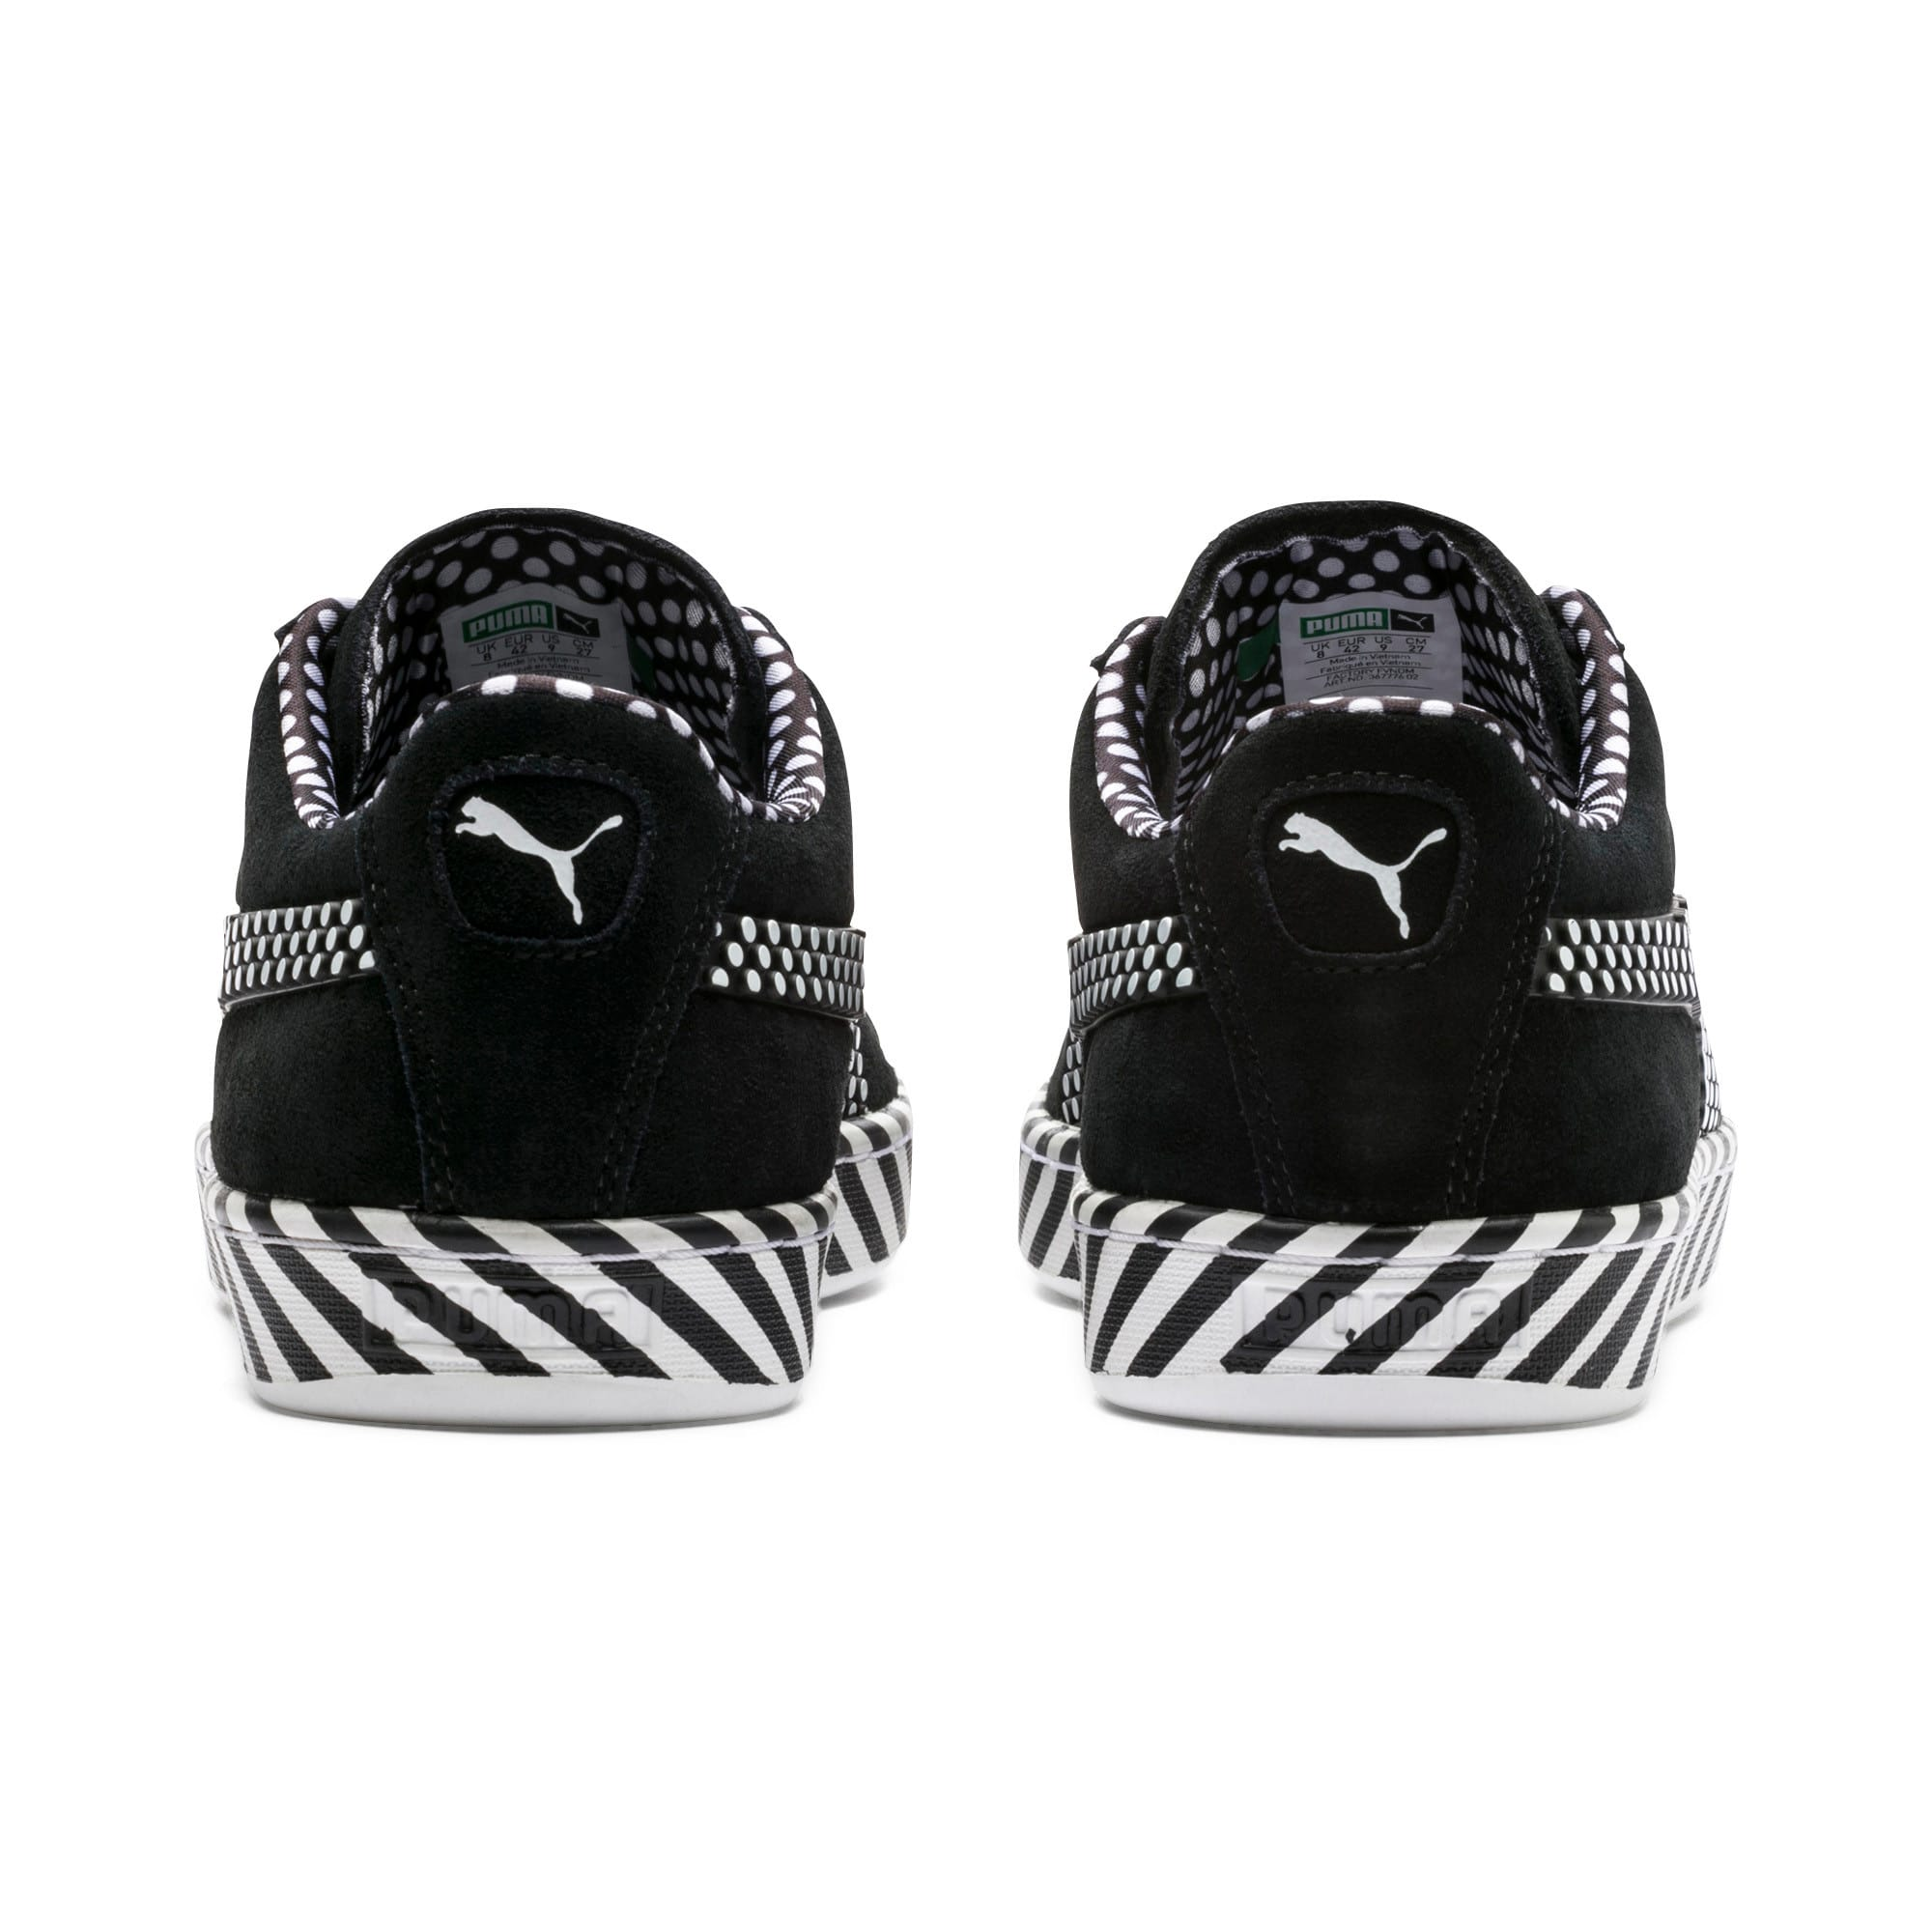 Thumbnail 4 of Suede Classic Pop Culture Sneakers, Puma Black-Puma White, medium